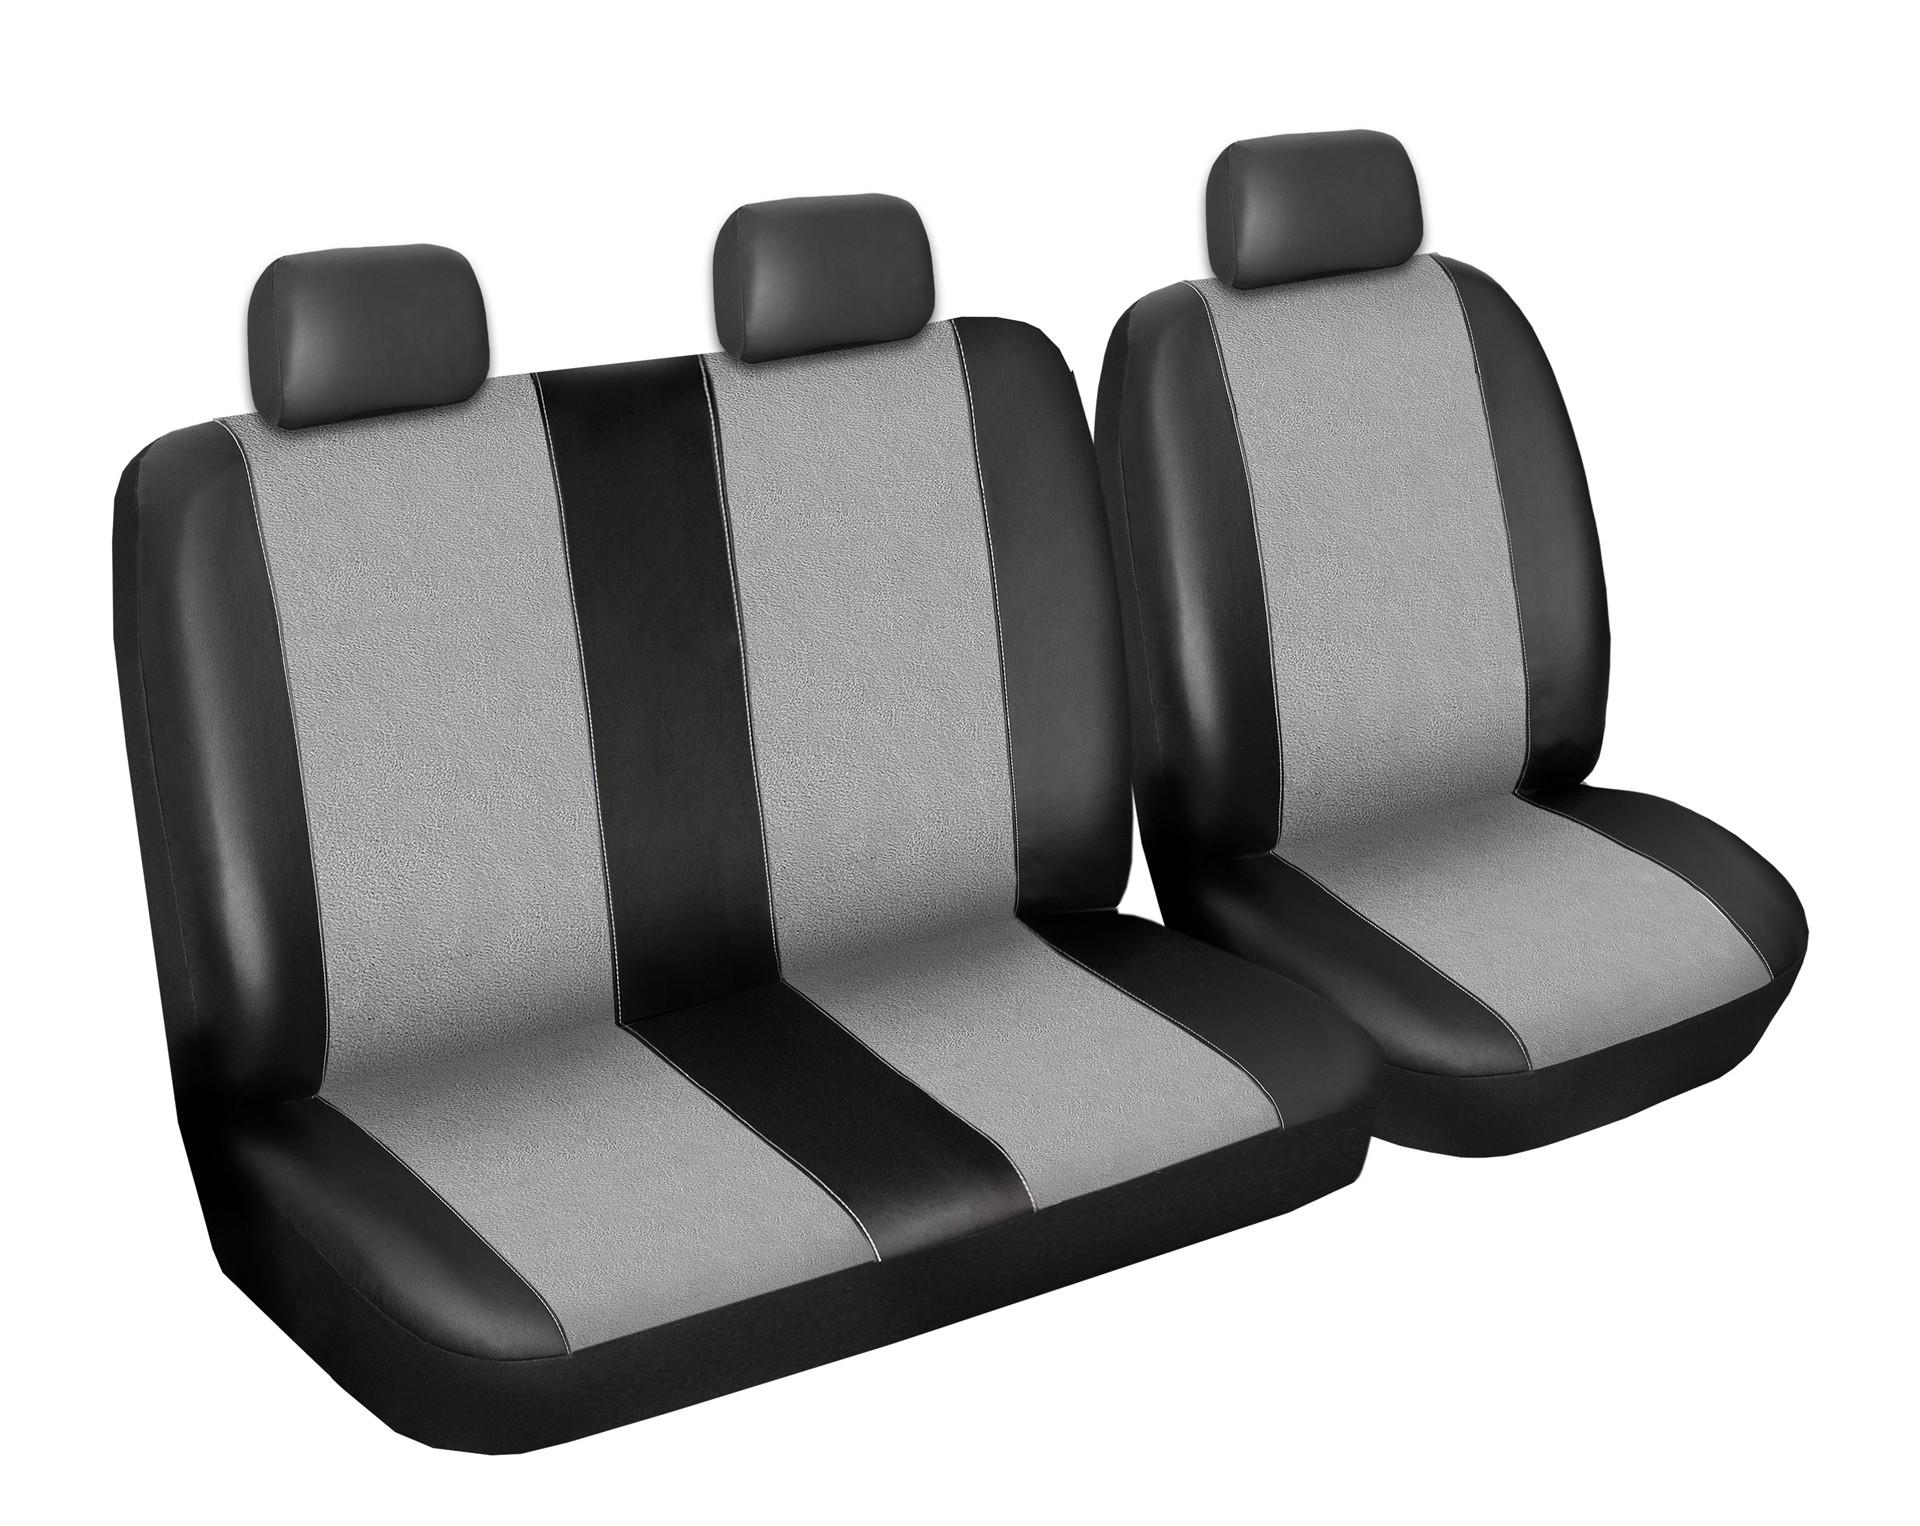 Autopotahy Citroen Jumper I, 3 místný, do r. 2006, Eco kůže + alcantara šedé